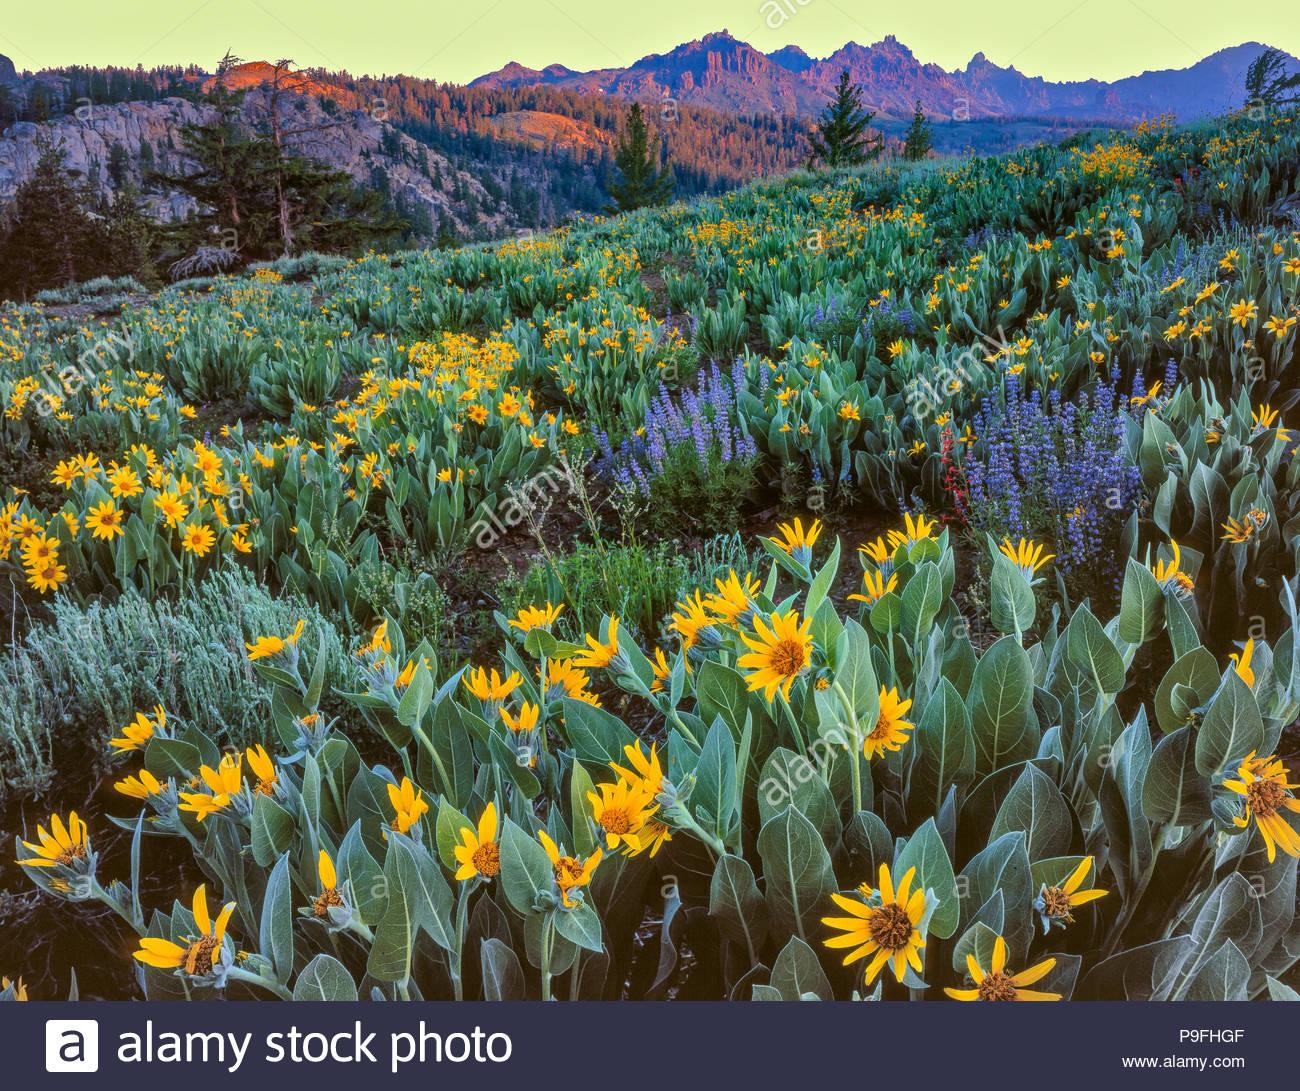 Arrowleaf Balsam Wurzel, Balsamorhiza sagittata, Lupin, Lupinus angustifolius, Carson-Iceberg Wüste, Toiyabe National Forest, Sierra Nevada Doppelzi. Stockbild